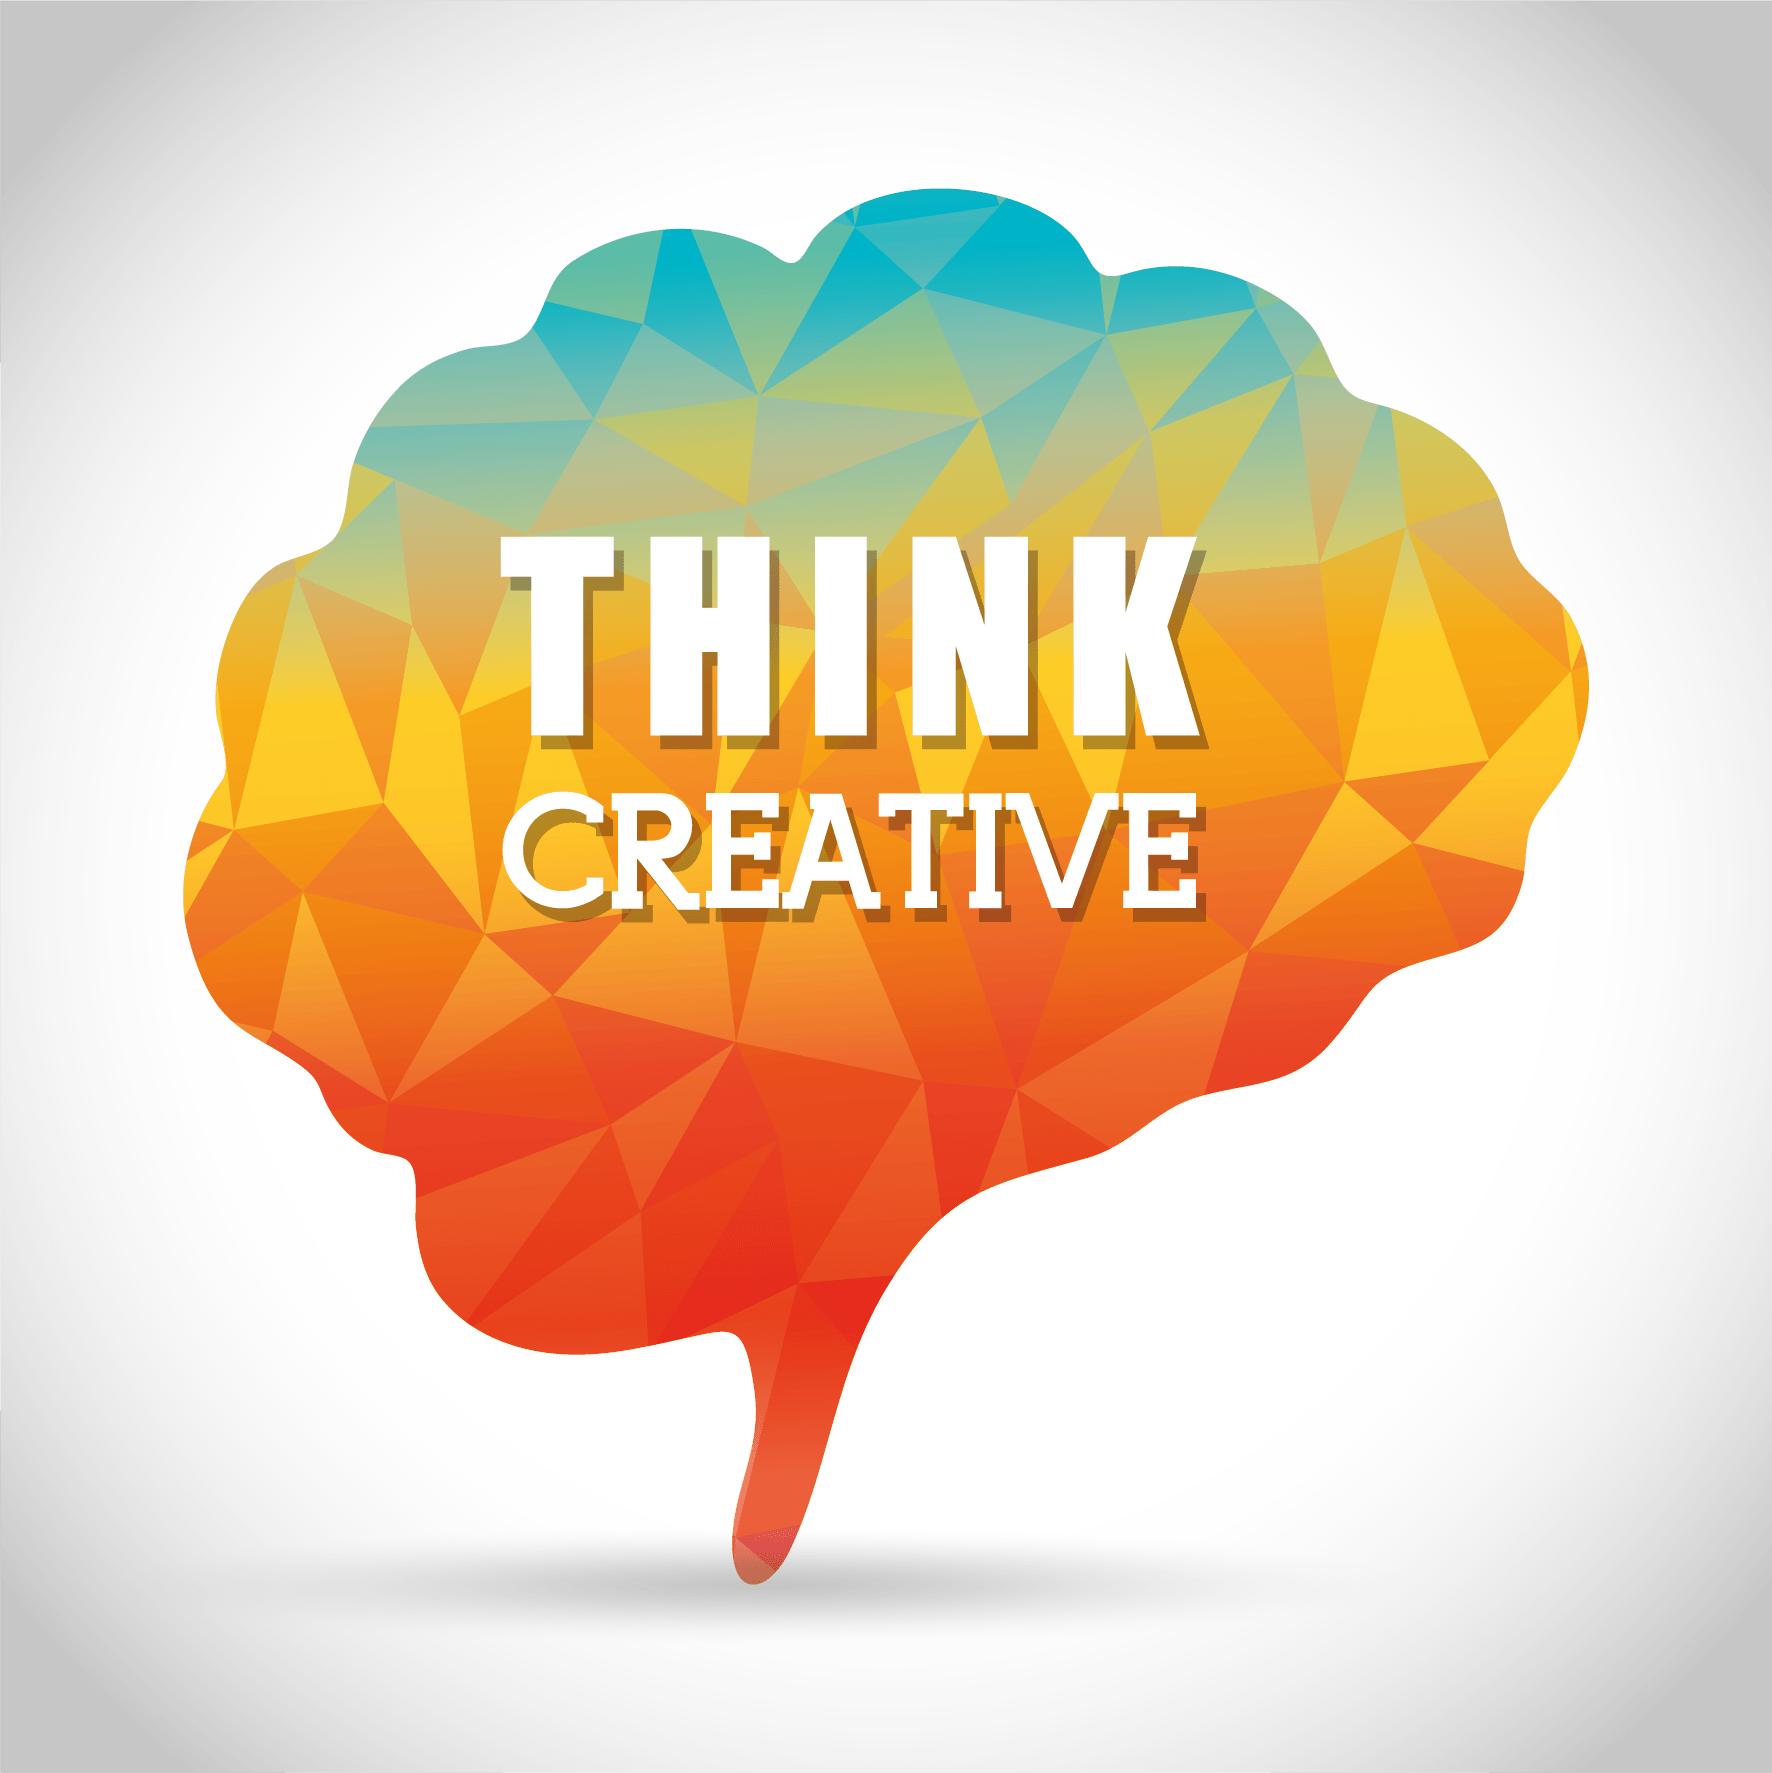 Digital Transformation driven by Design Thinking